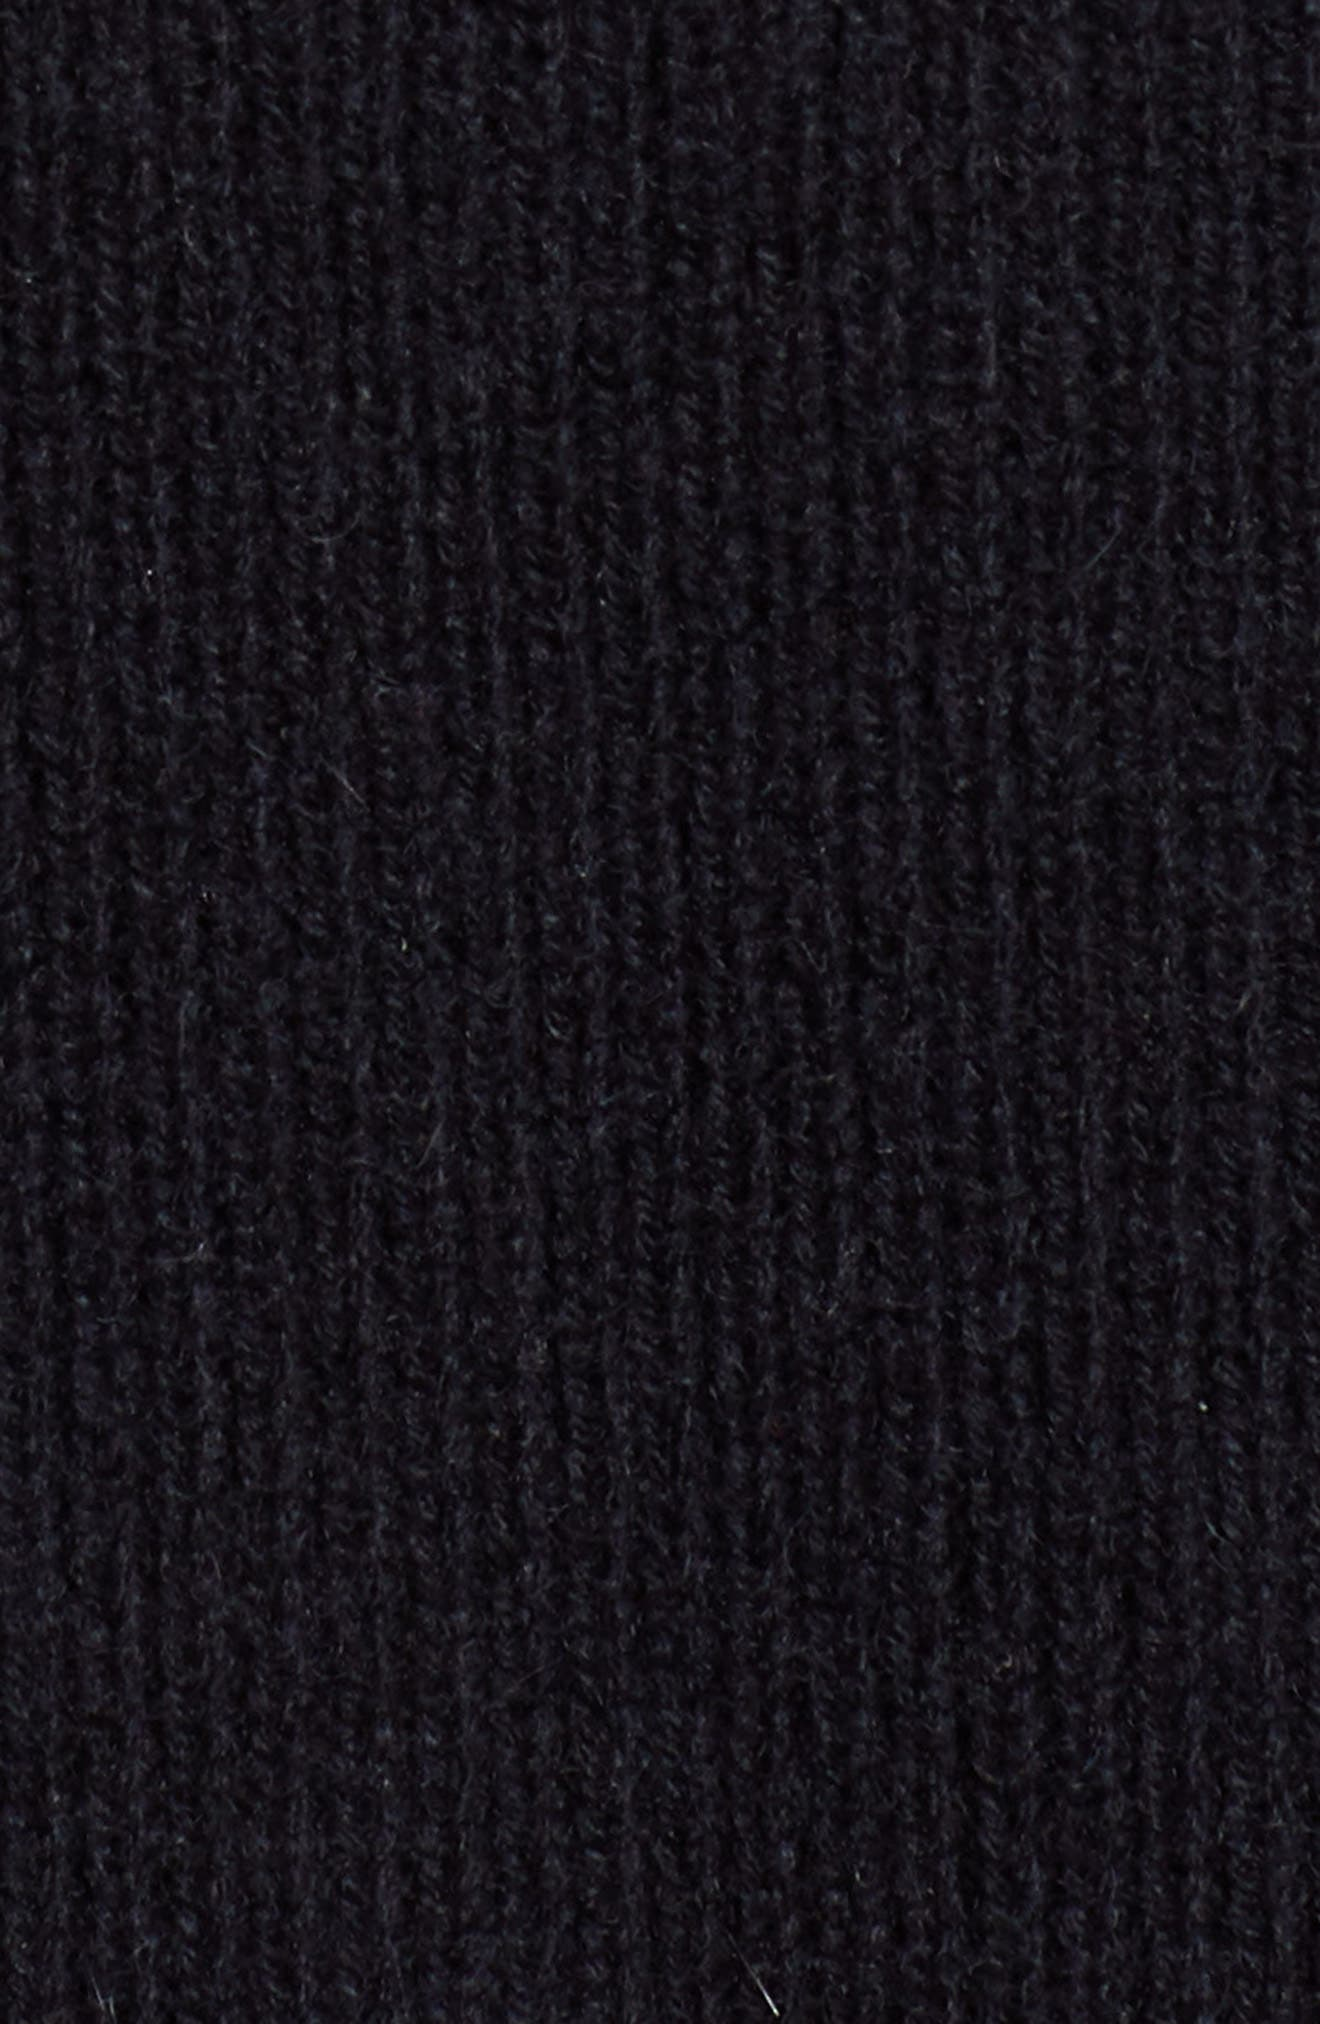 Blouson Sleeve Long Cashmere Cardigan,                             Alternate thumbnail 14, color,